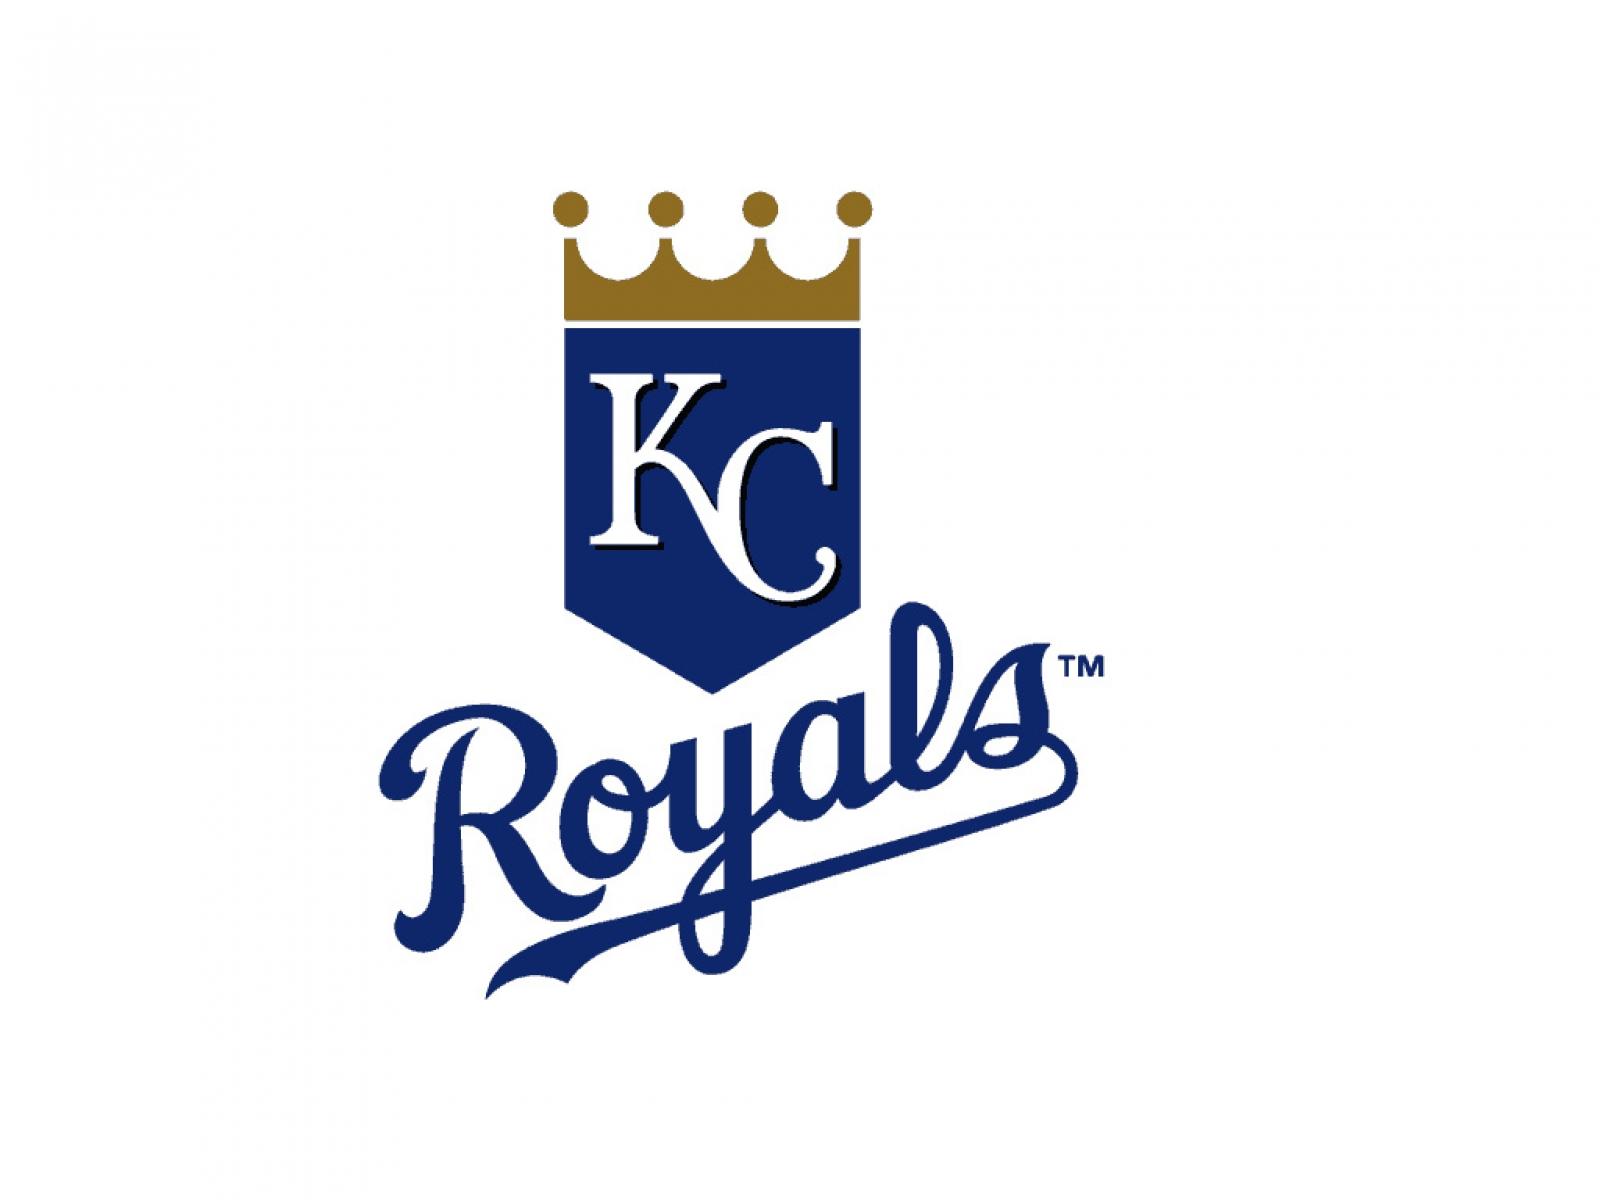 com wallpapers logos sports baseball kansas city royals html 1600x1200